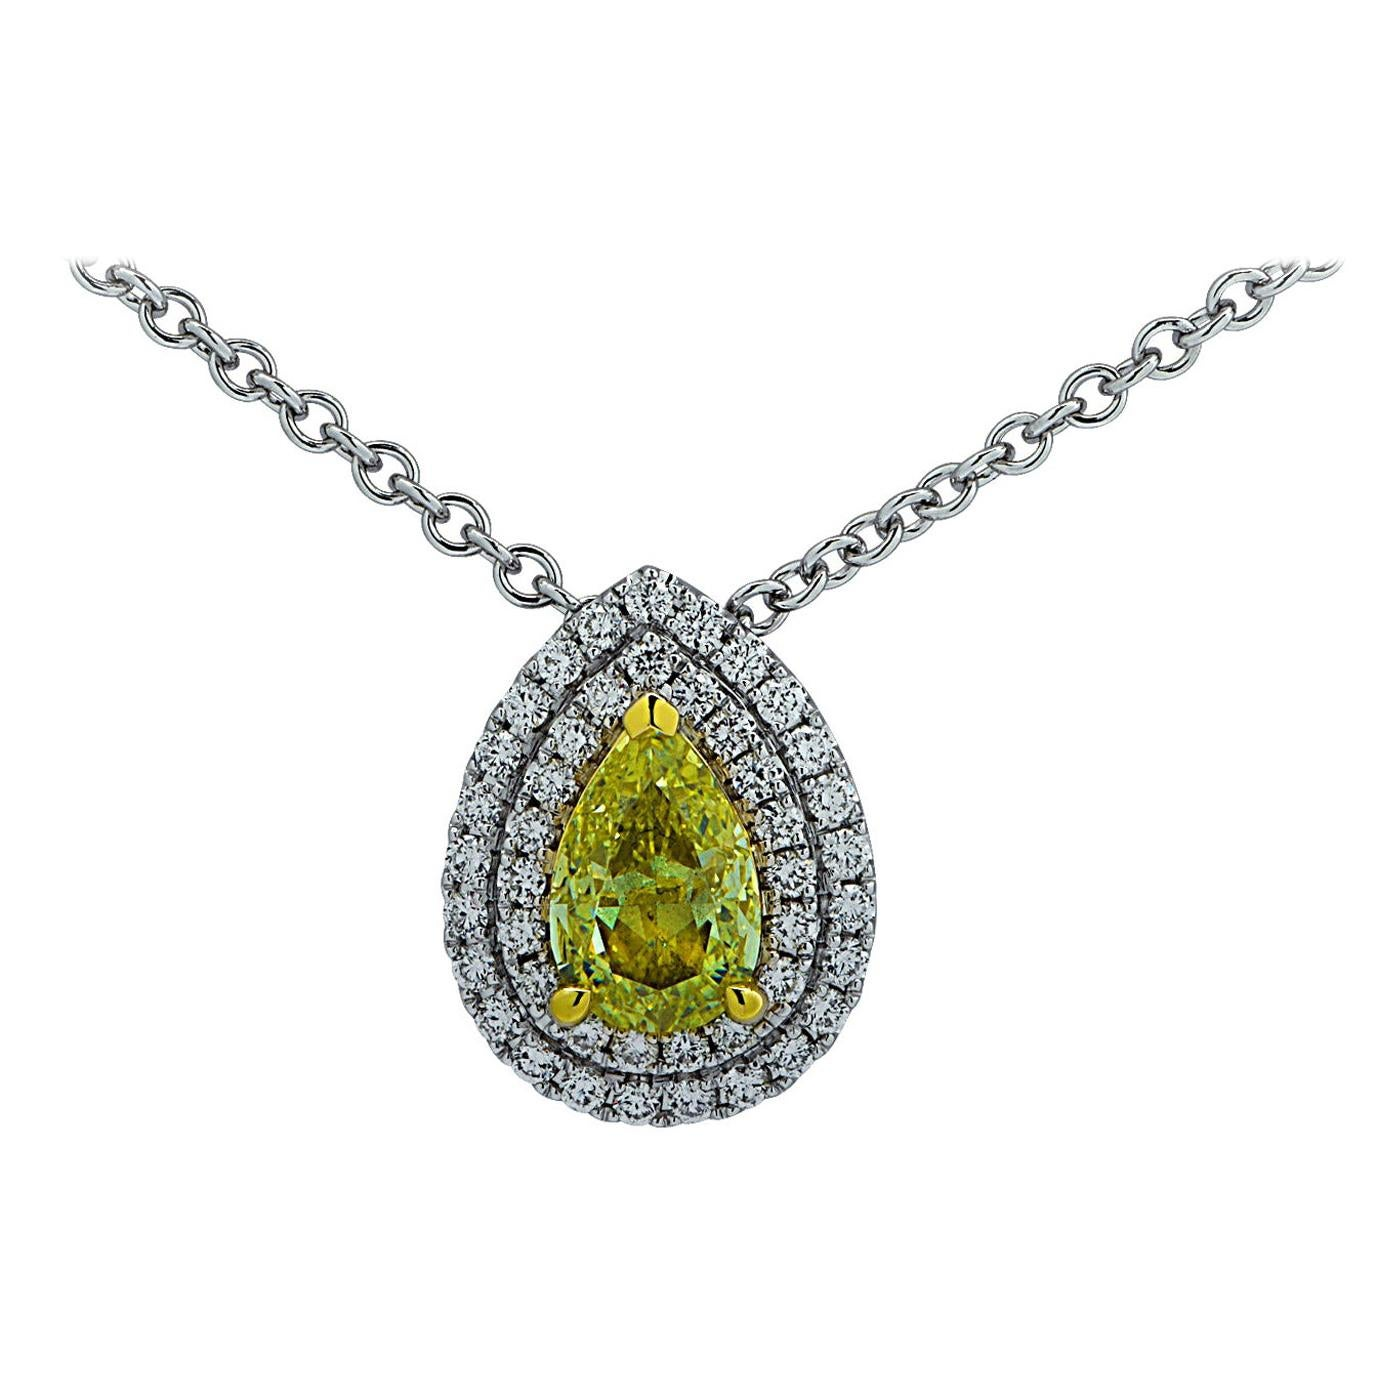 Vivid Diamonds GIA Certified 1.05 Carat Fancy Yellow Diamond Pendant Necklace